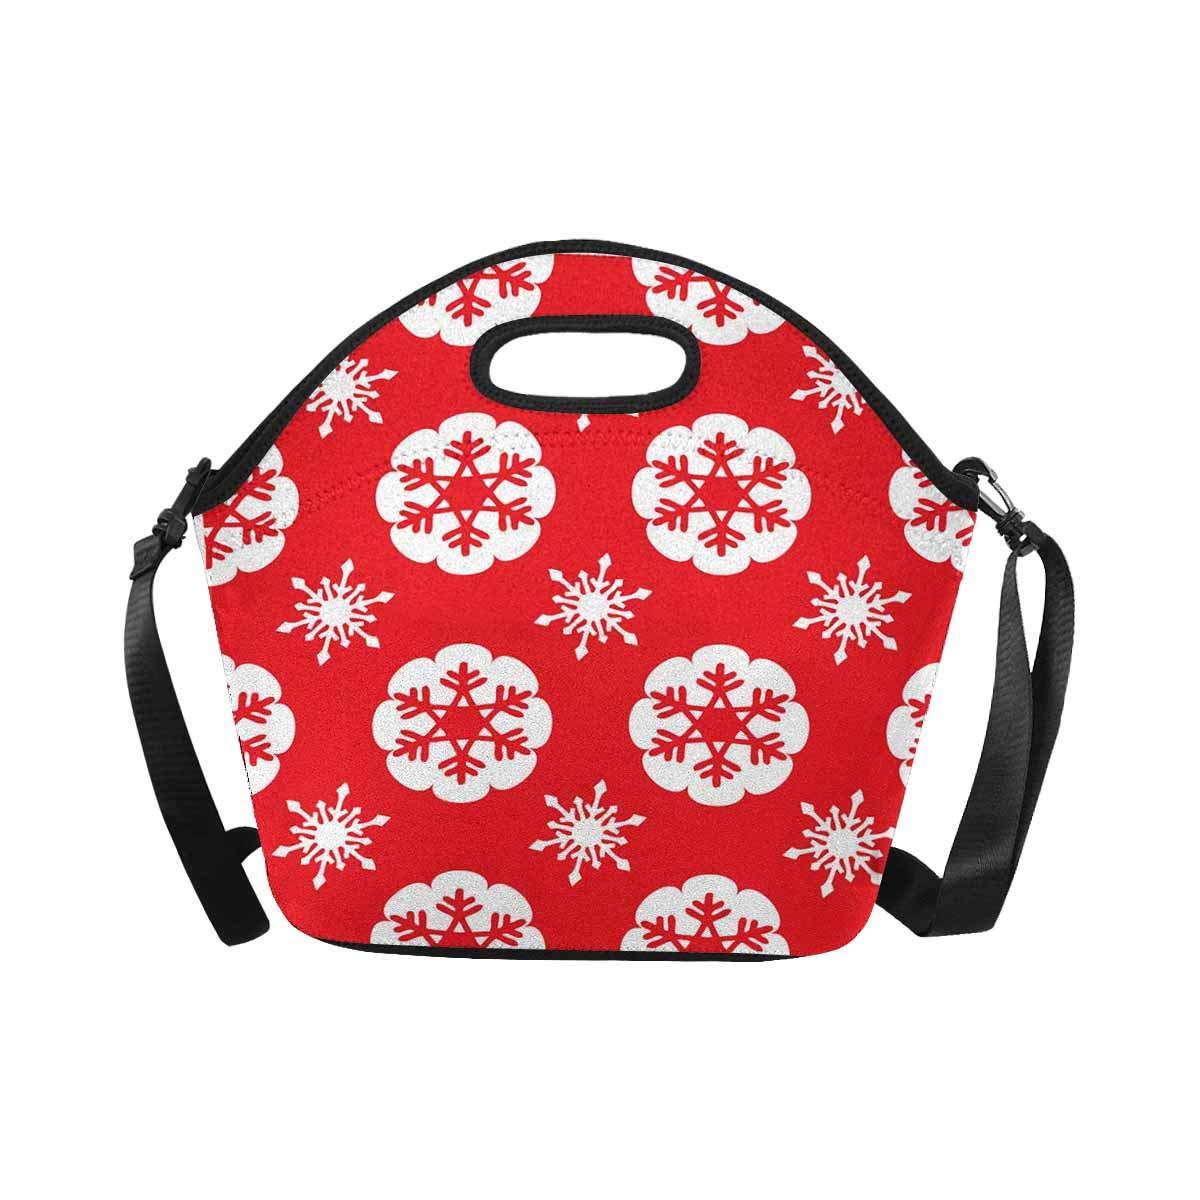 c89e2e612b5c Amazon.com: InterestPrint Insulated Neoprene Lunch Bag Christmas ...